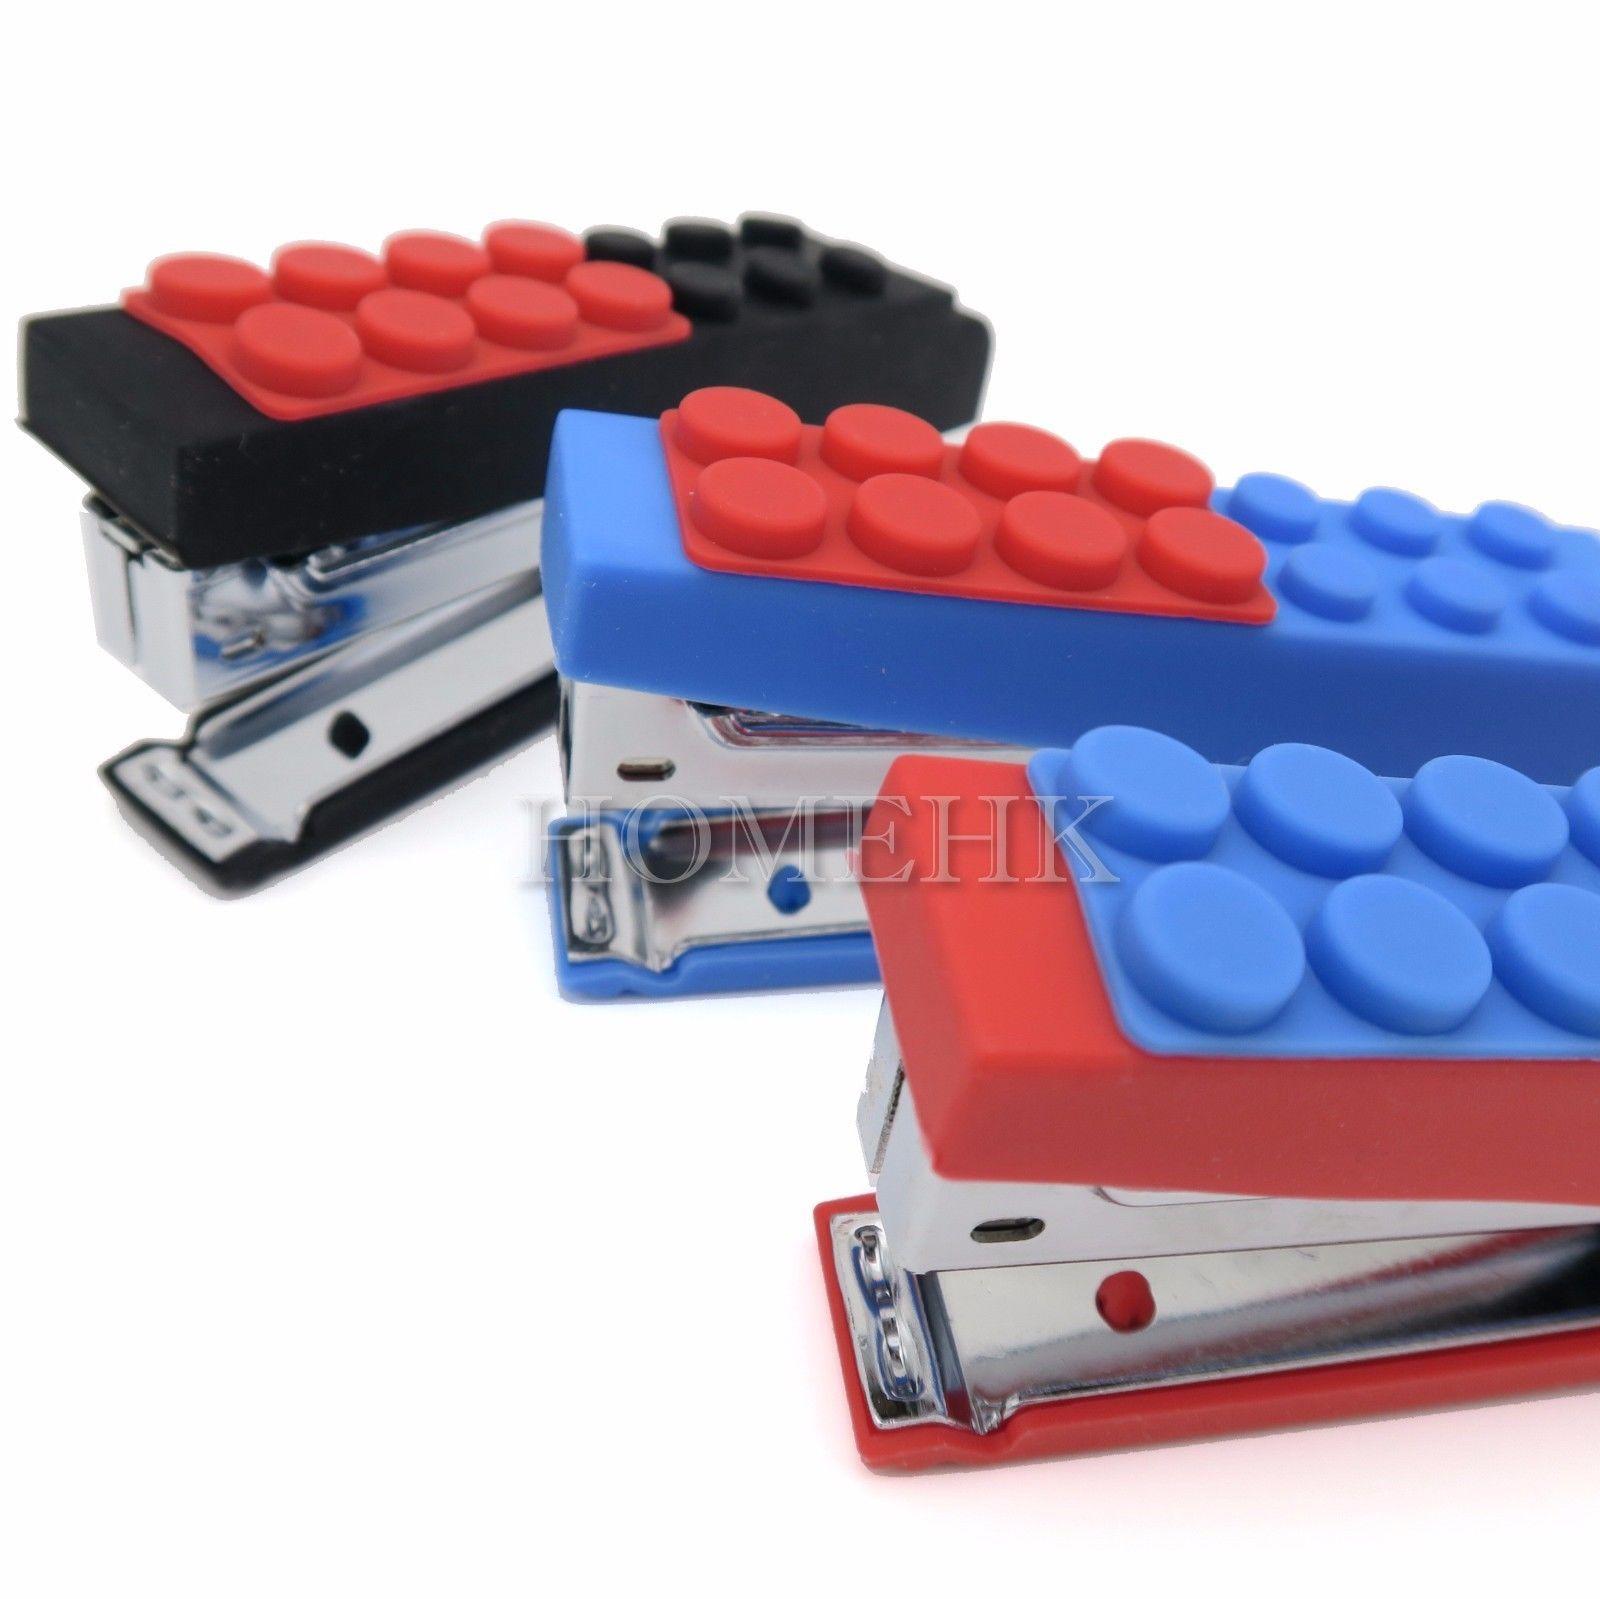 Bricks Lego Stapler Paper Portable office home school stationery staple silicon